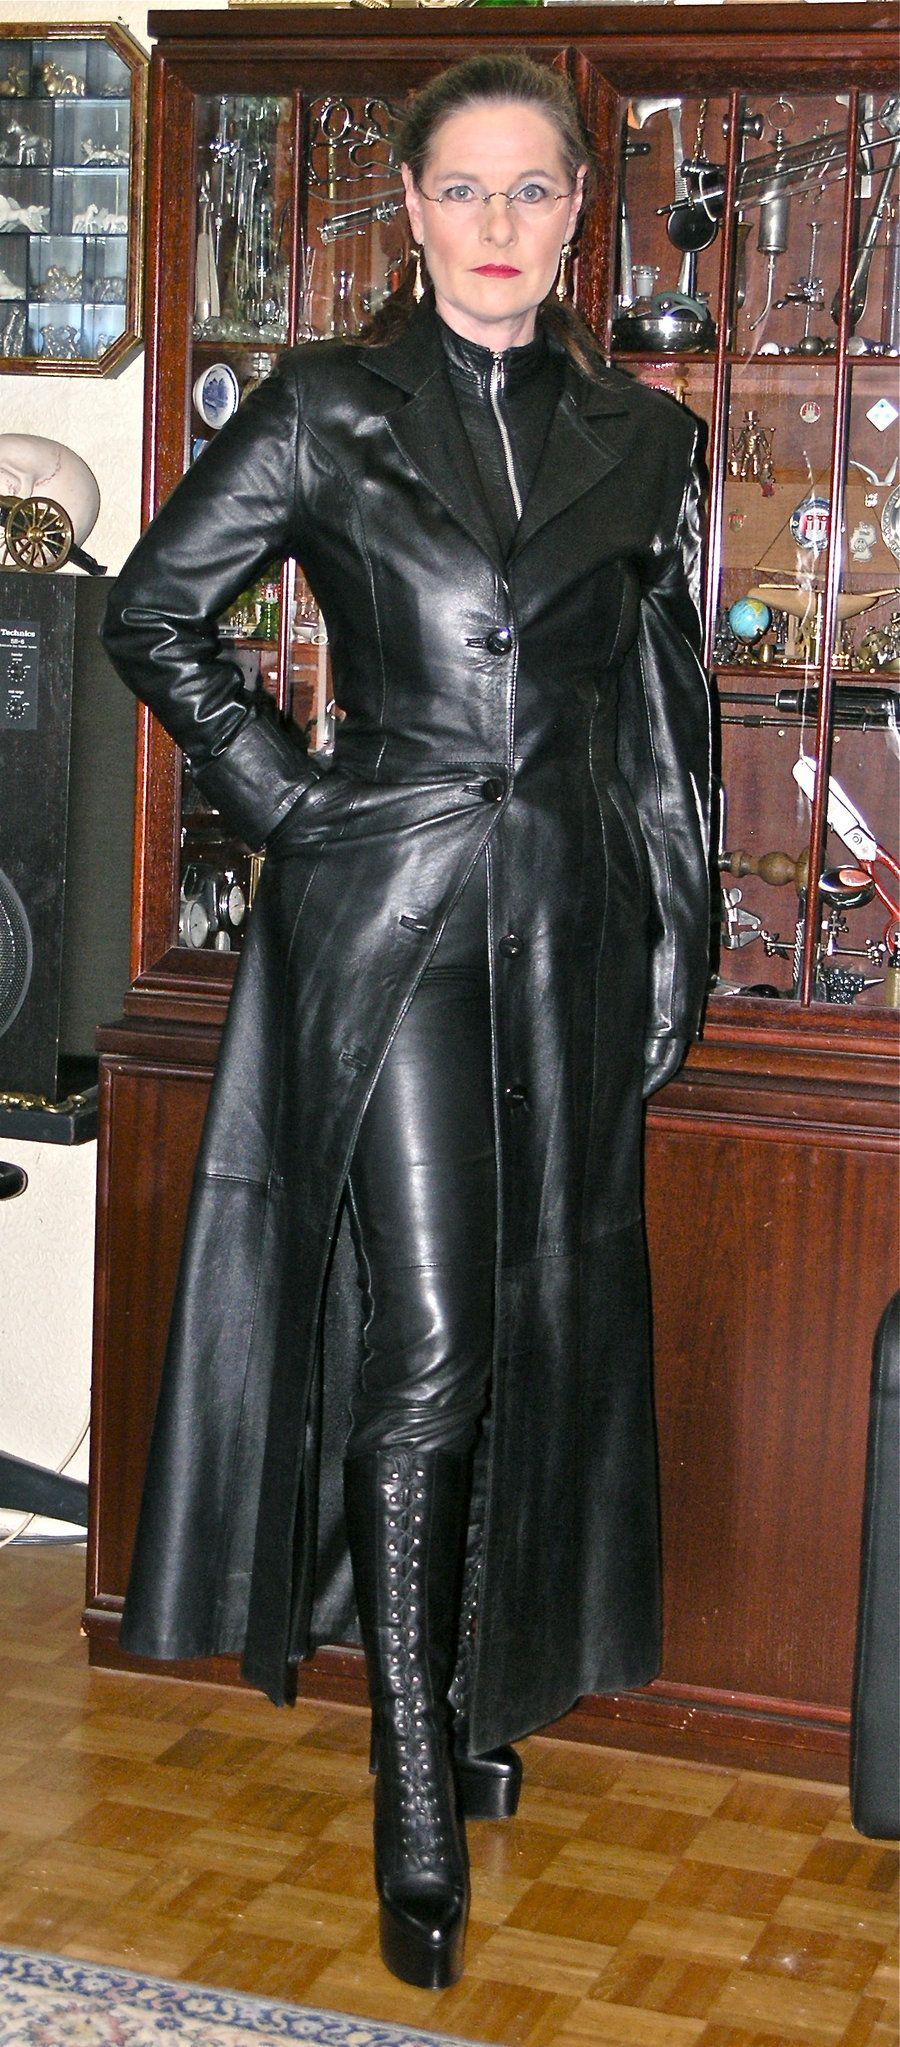 Emma Diaz on Twitter | Leather mistress, Long leather coat